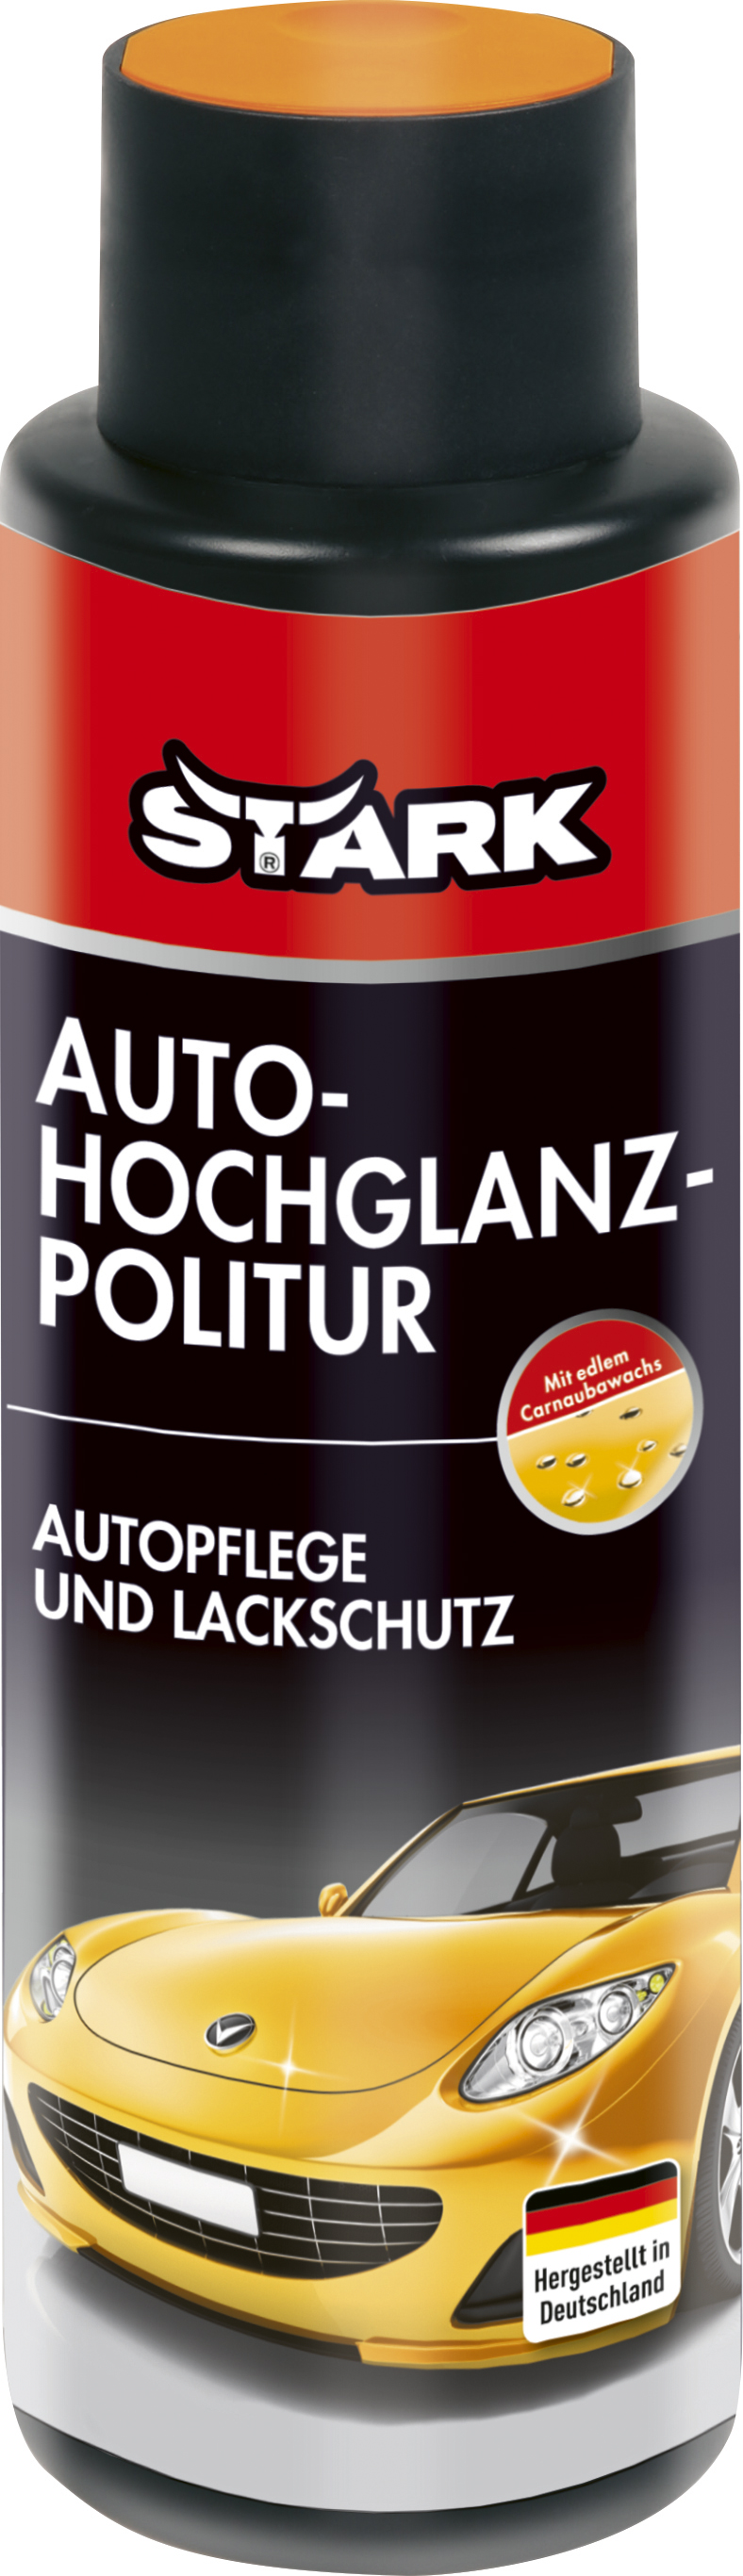 STARK 40019 Autohochglanzpolitur 500ml. GP:7,98/L Autopflege und Lackschutz